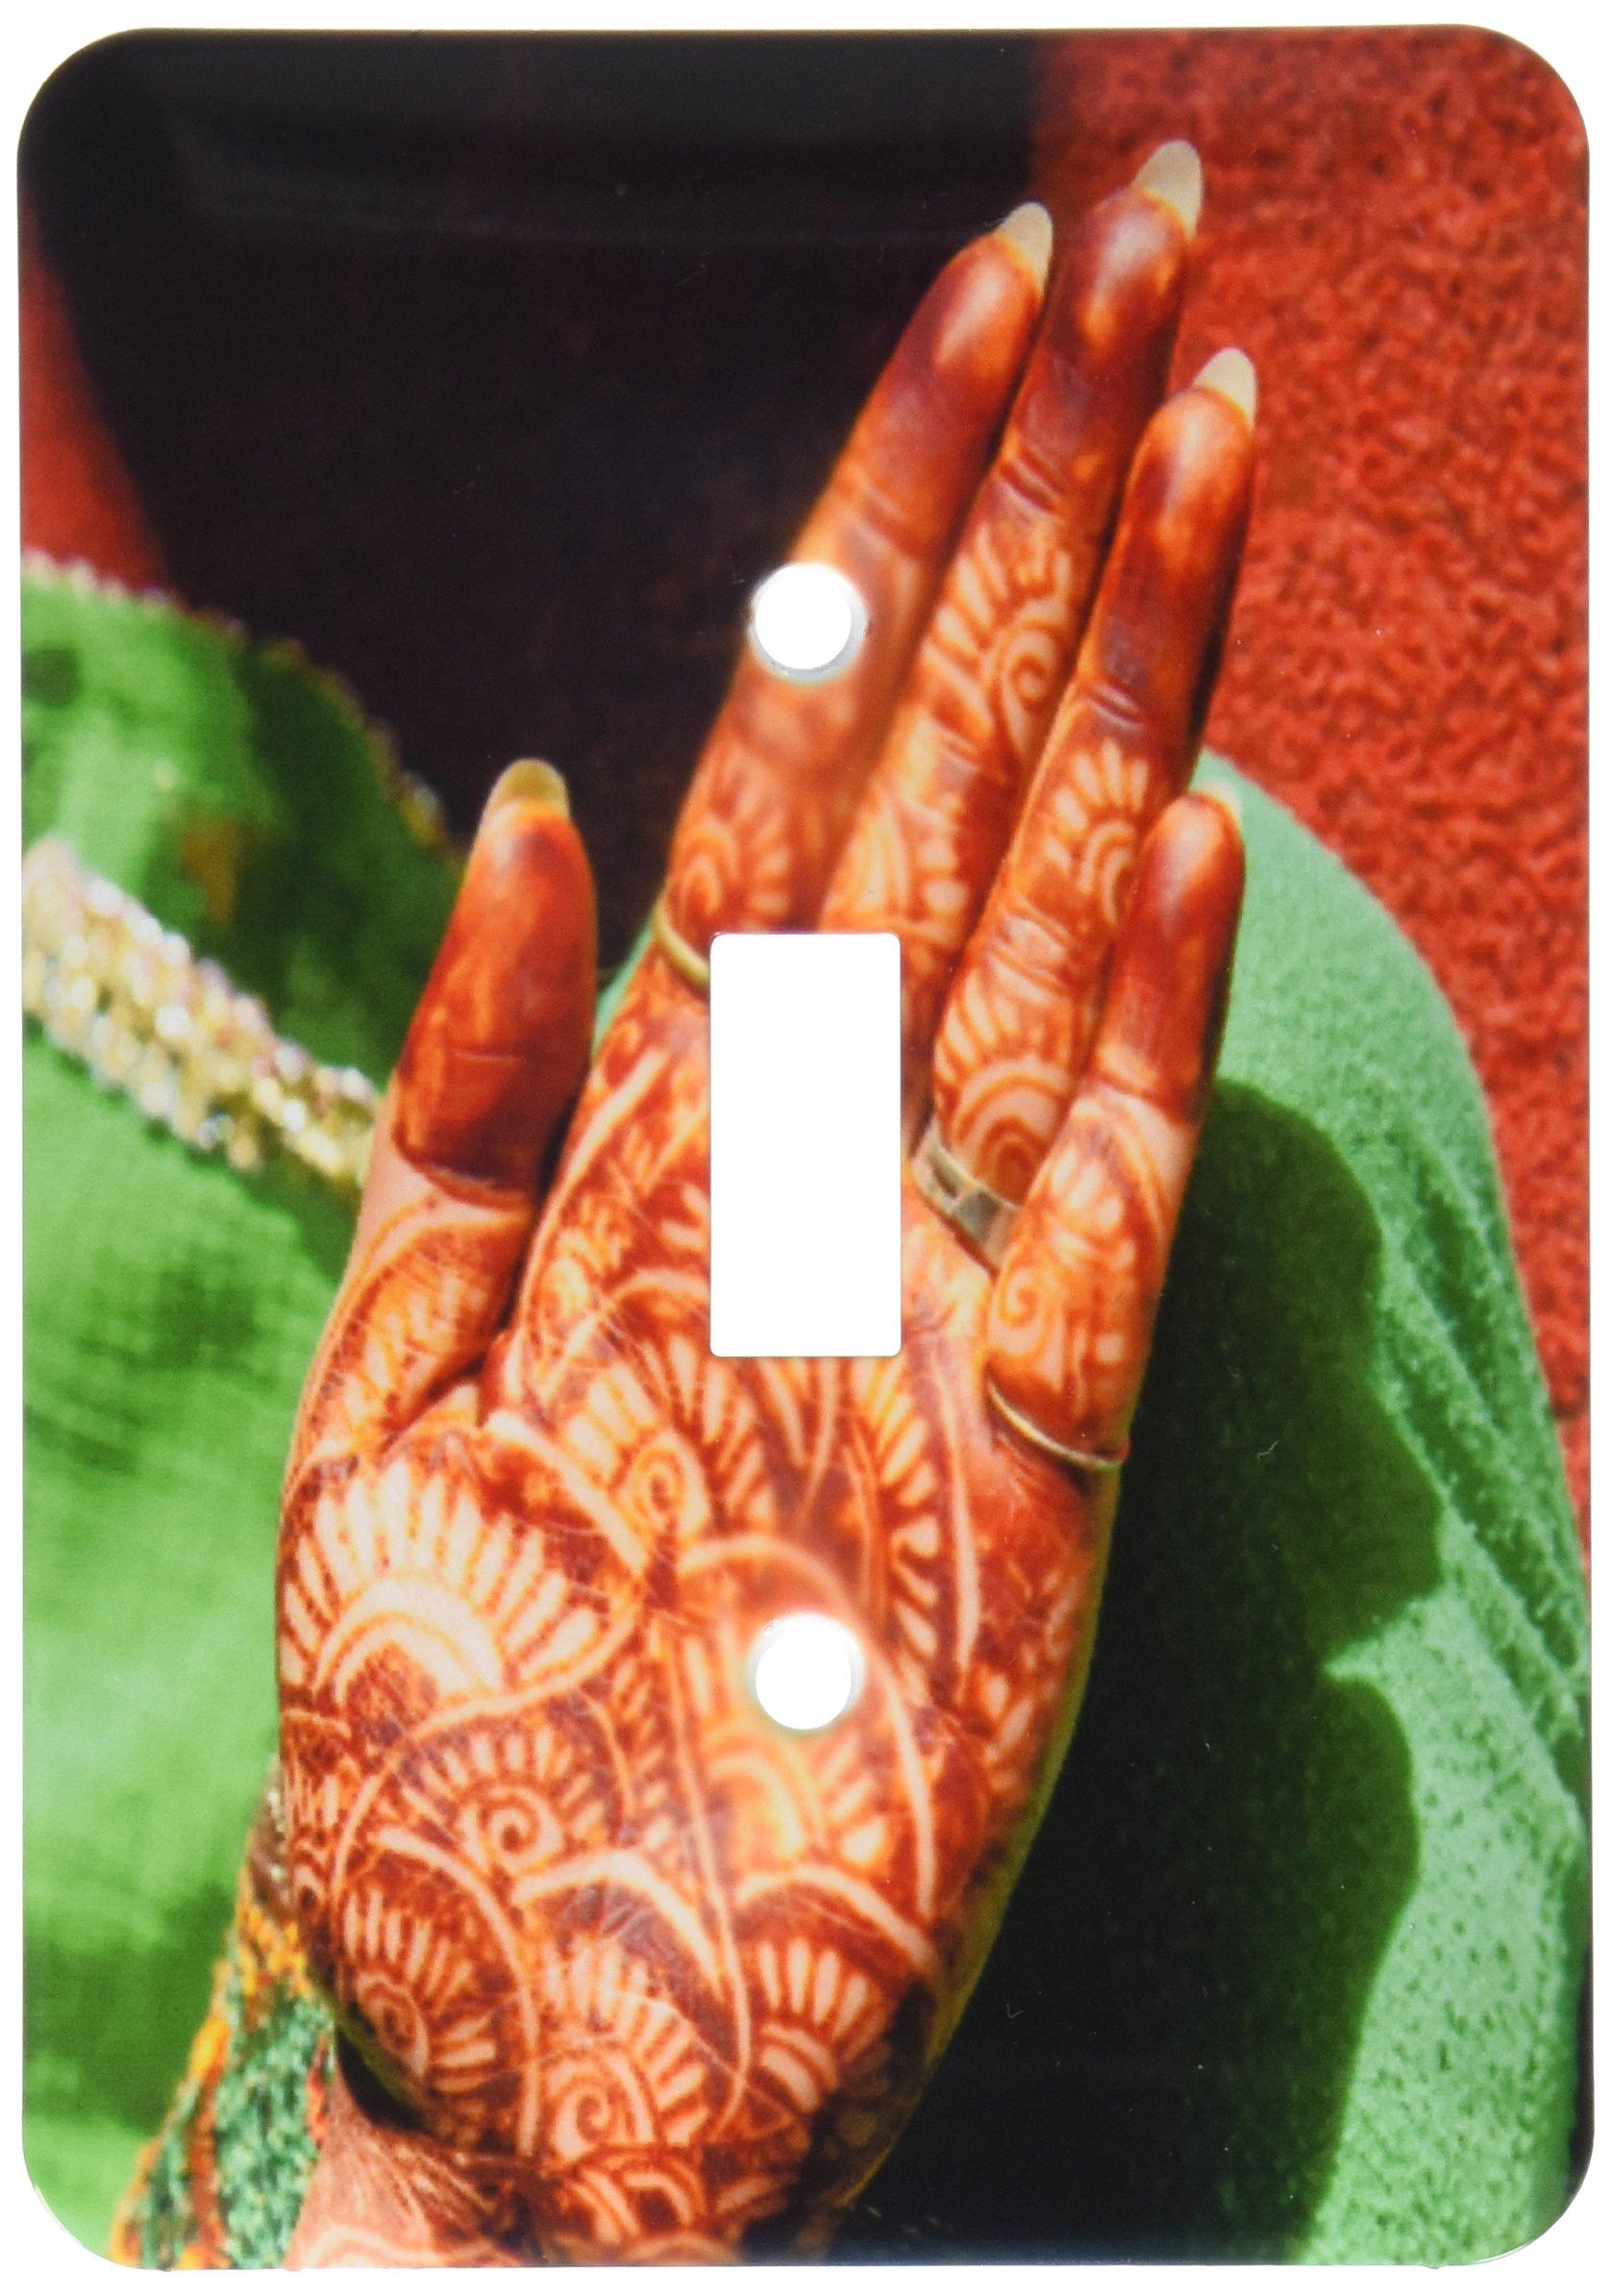 3dRose lsp_187377_1 Indian Henna Tattoo Design on Hand, Dehradun, India Single Toggle Switch